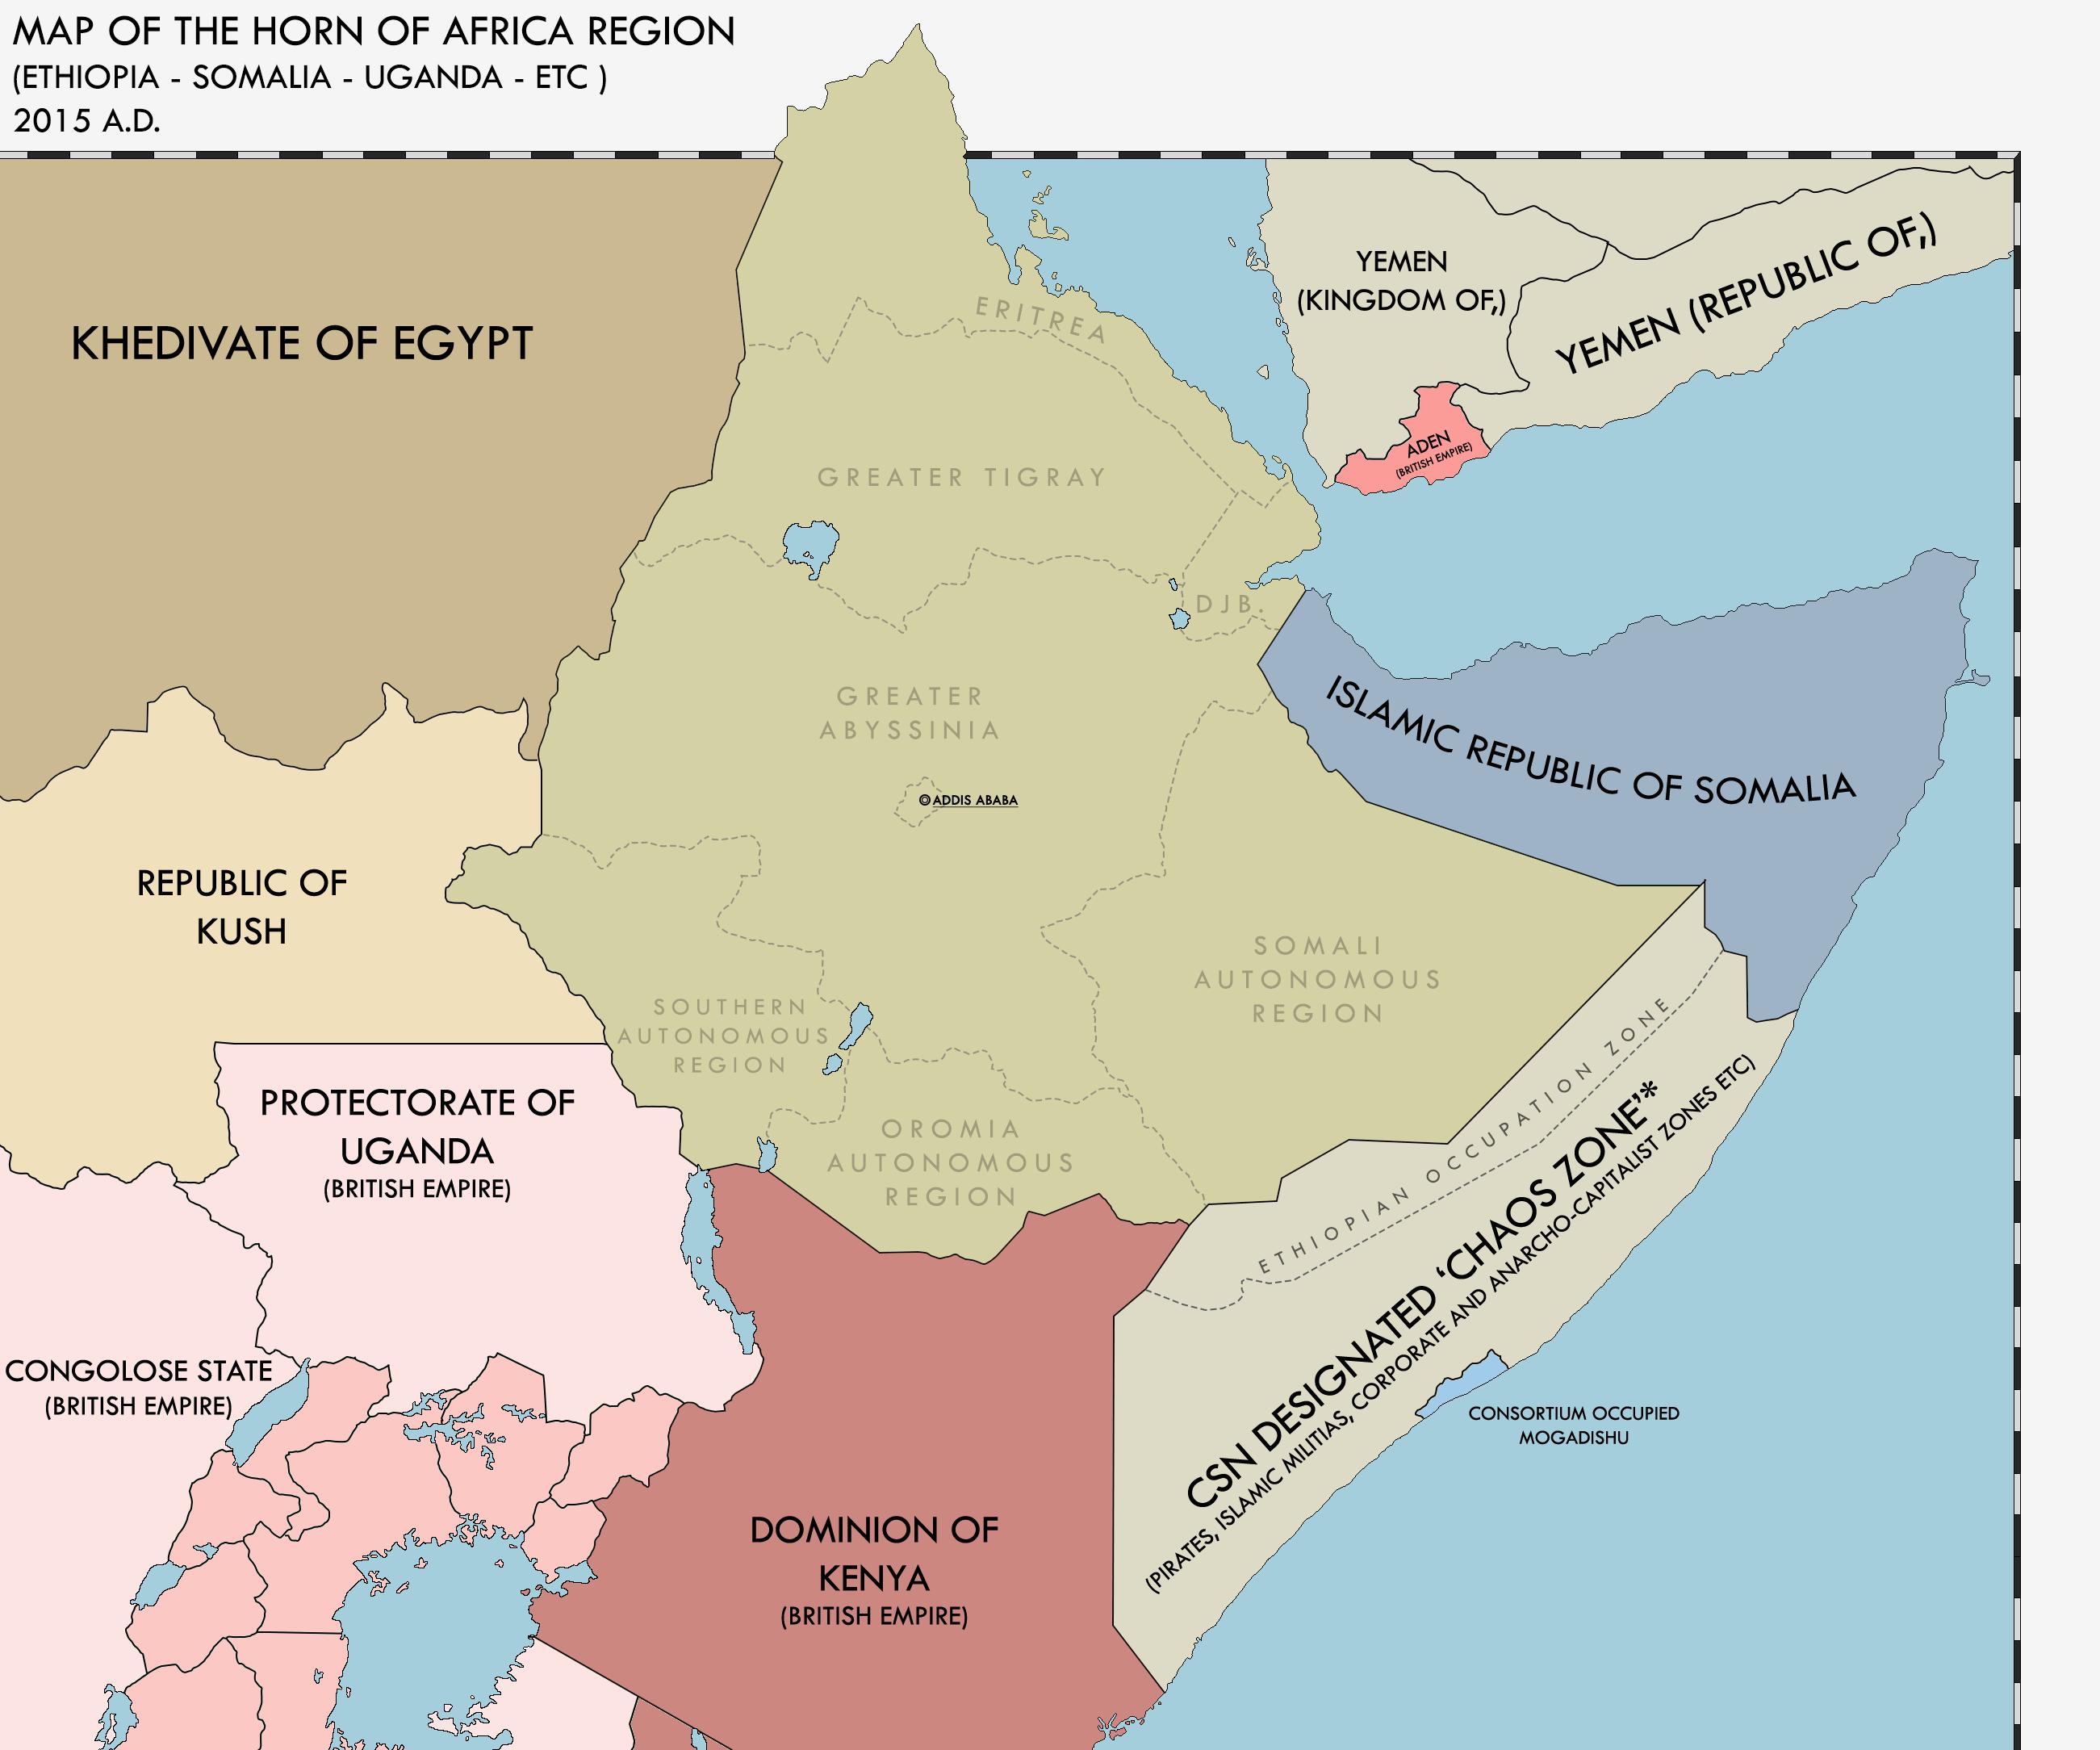 Map Of The Horn Of Africa Rev Redux By KitFisto On DeviantArt - Horn of africa map